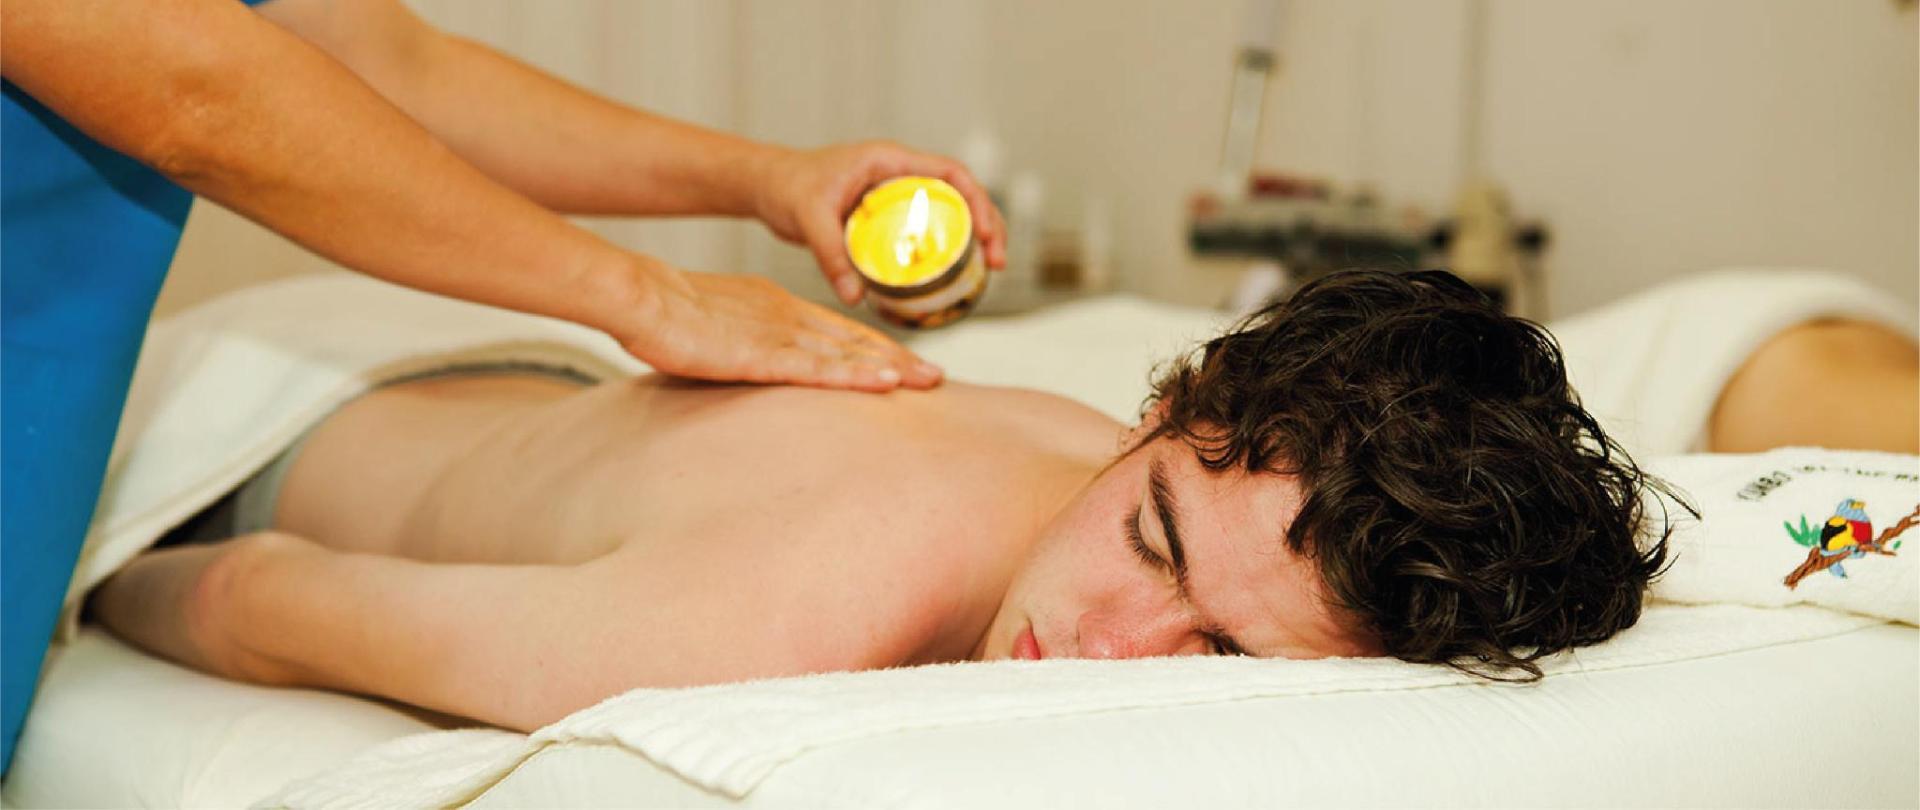 Yumbo-Spa-y-Resort-Hotel-en-Gualea-massage.jpg